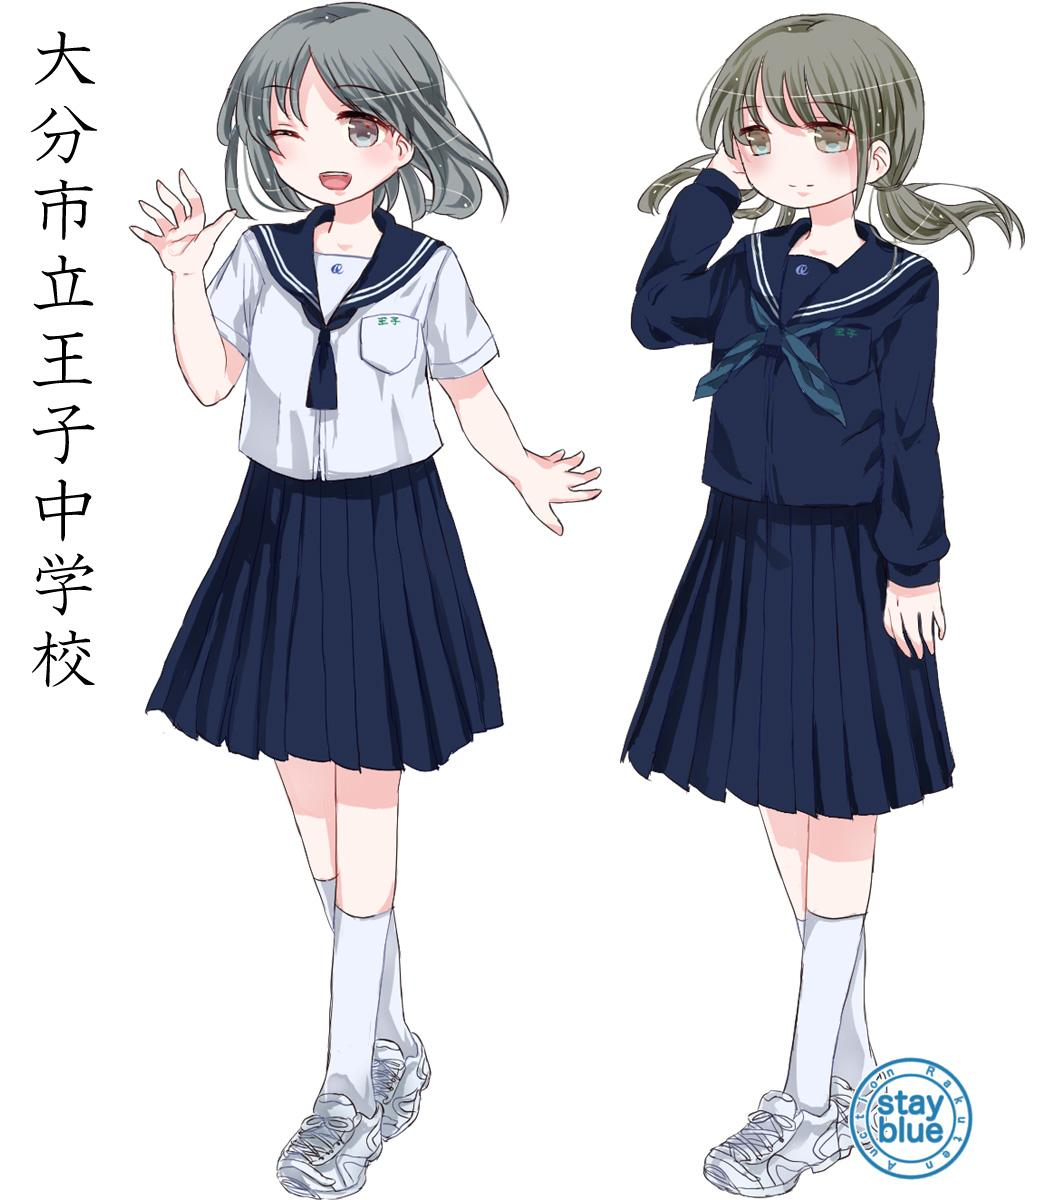 stayblue@学校制服図鑑 on Twitt...